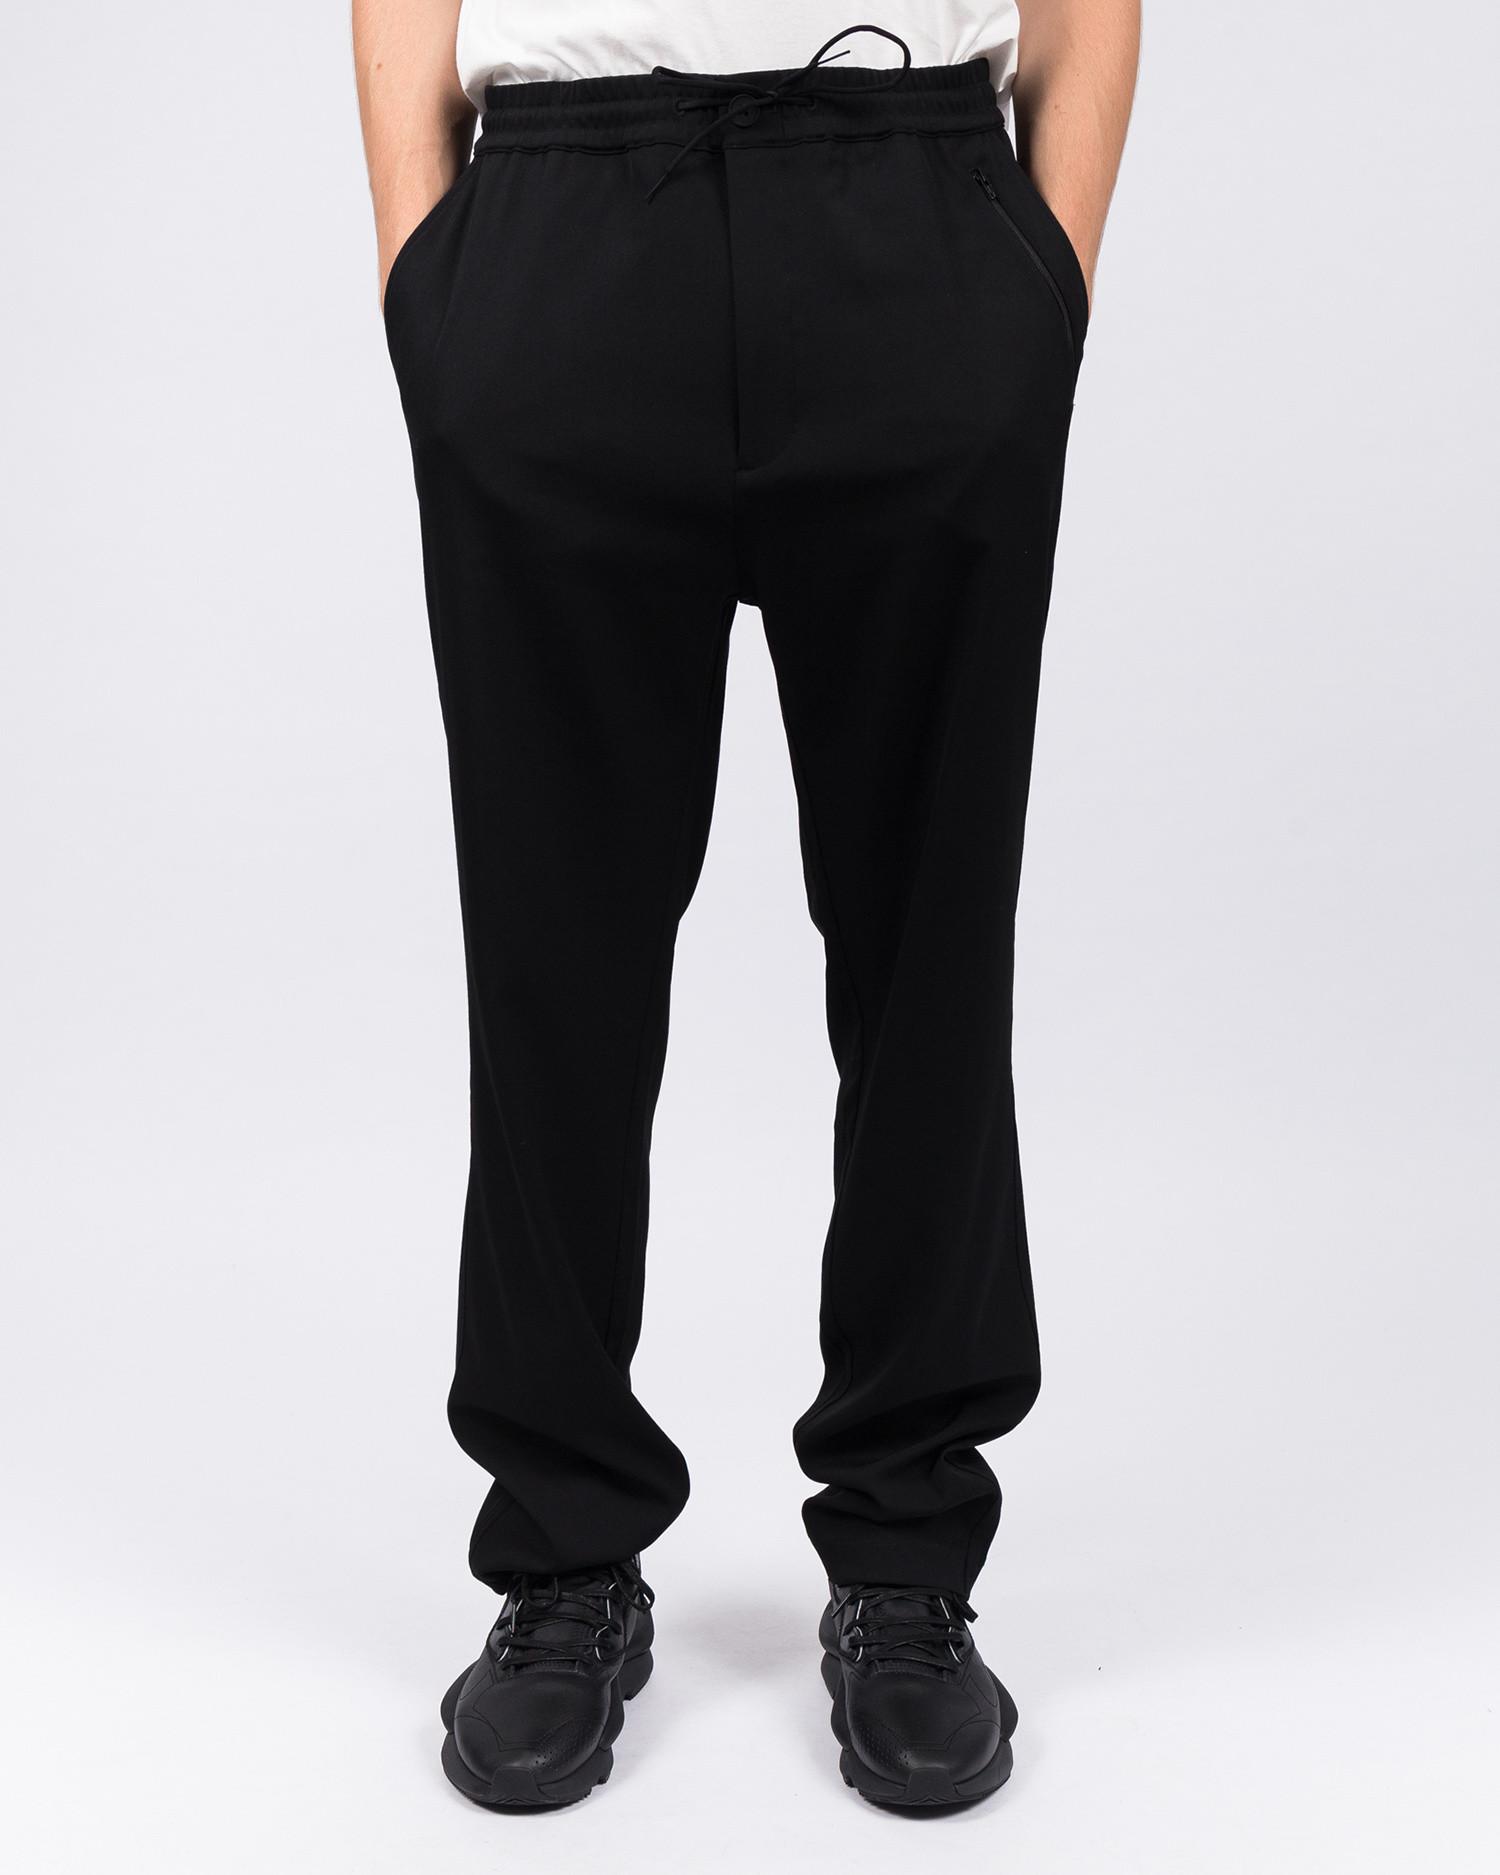 Adidas Y-3 Wool Sateen Straight Leg Pant Black